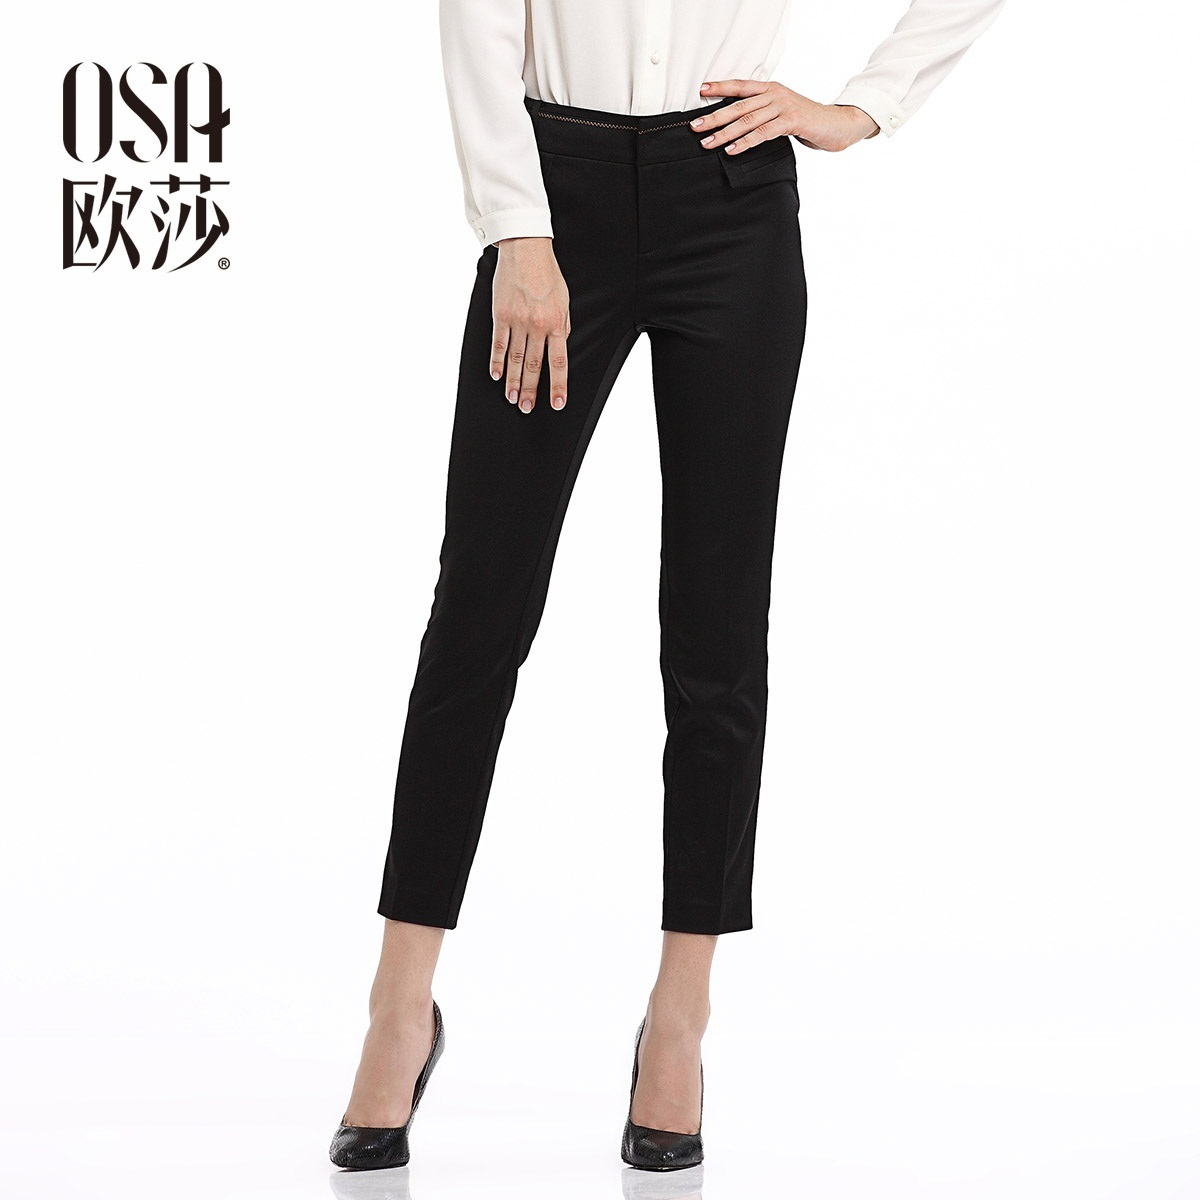 OSA2014 Autumn Pants Trousers Pencil Pants Pants